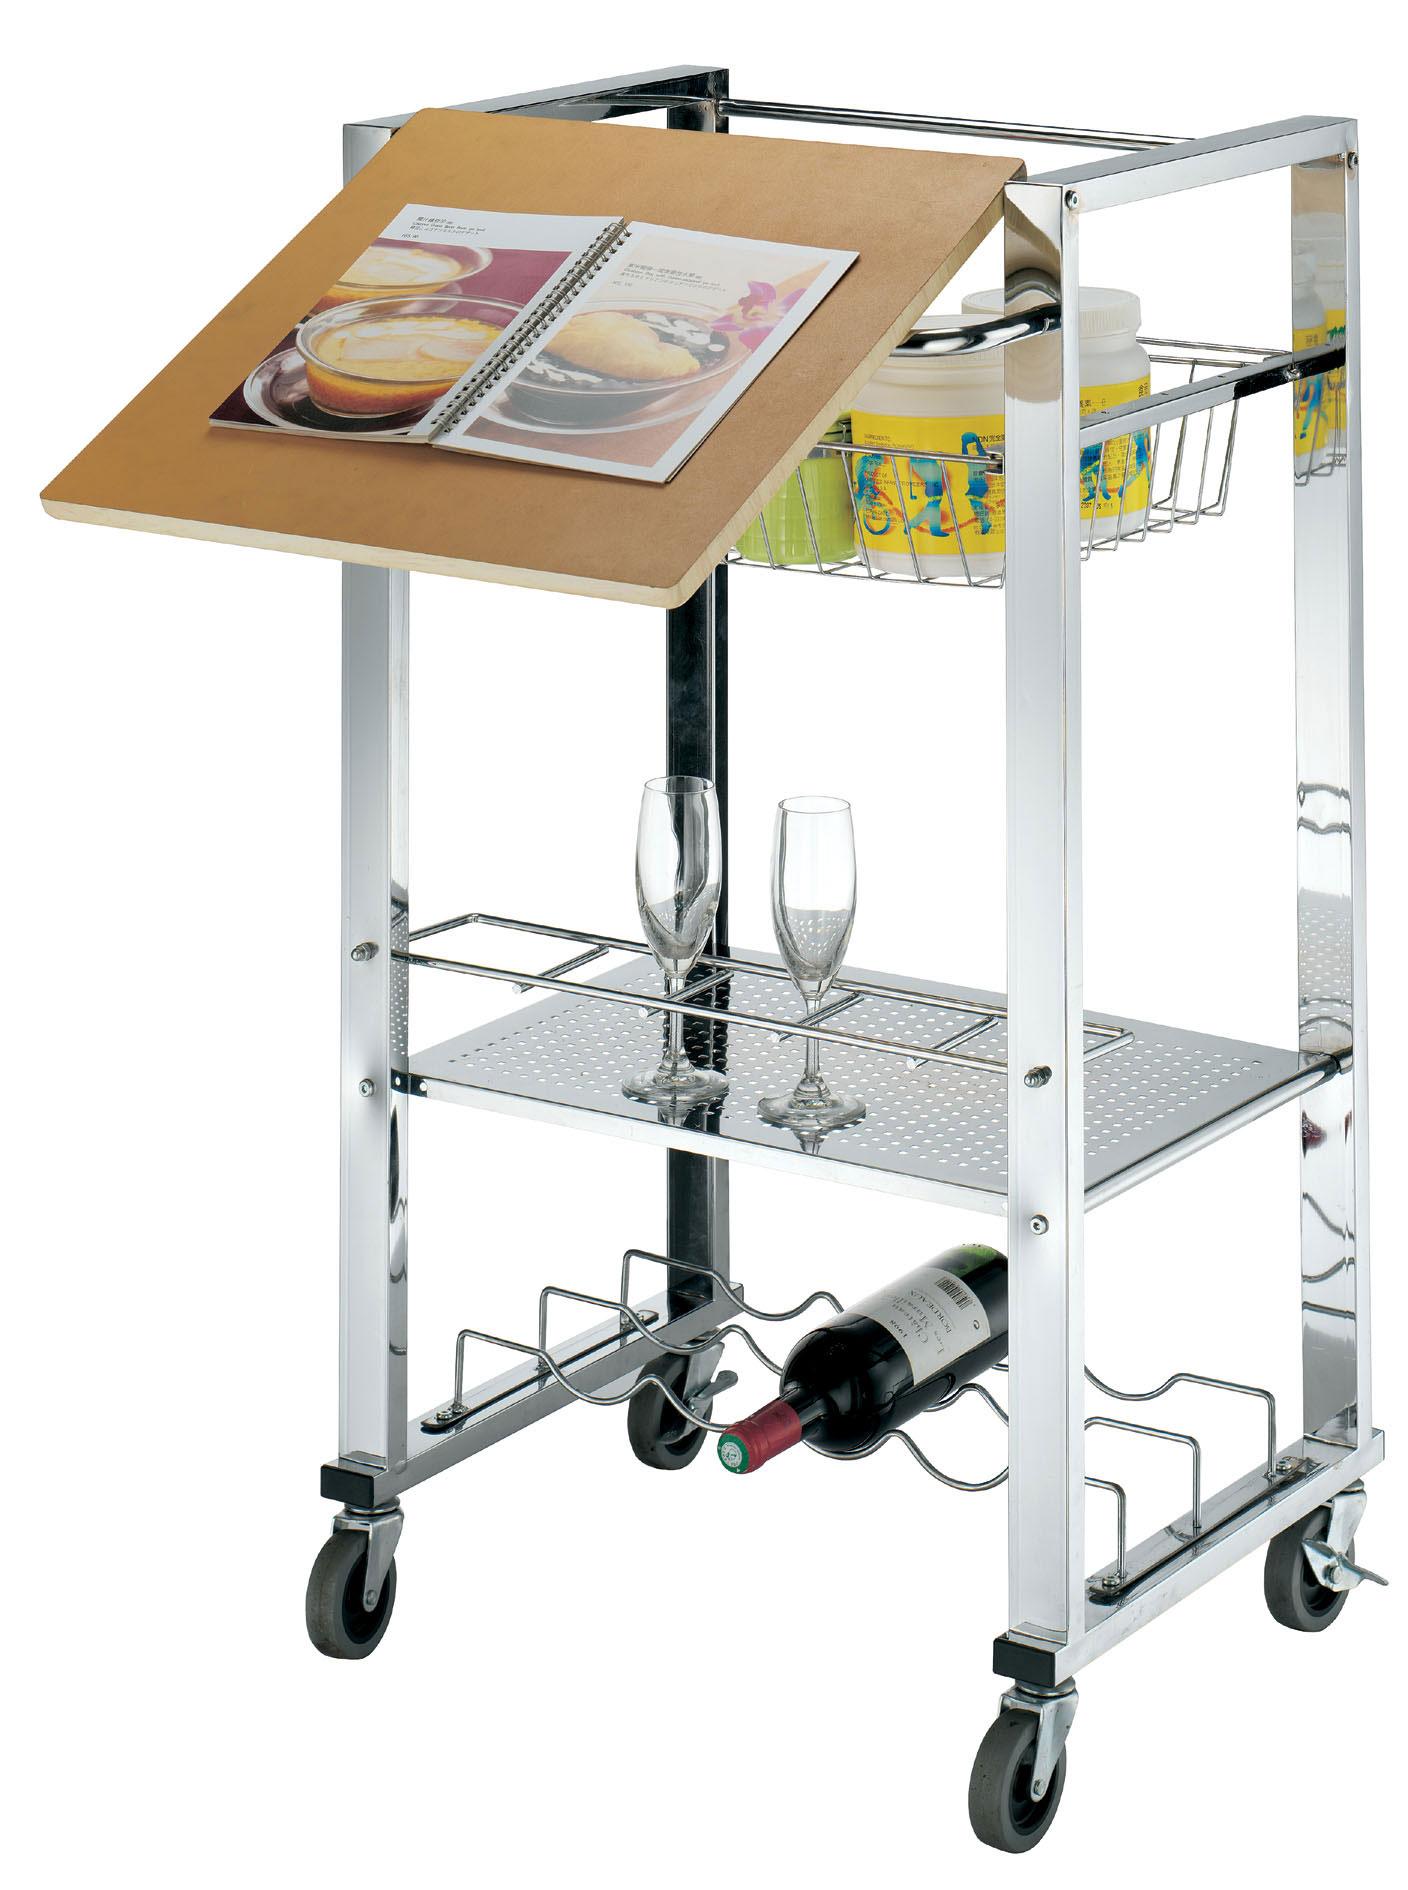 Trolley Service Kitchen Cart 4 Tier Wheels Storage Serving Steel Chrome Board Ebay